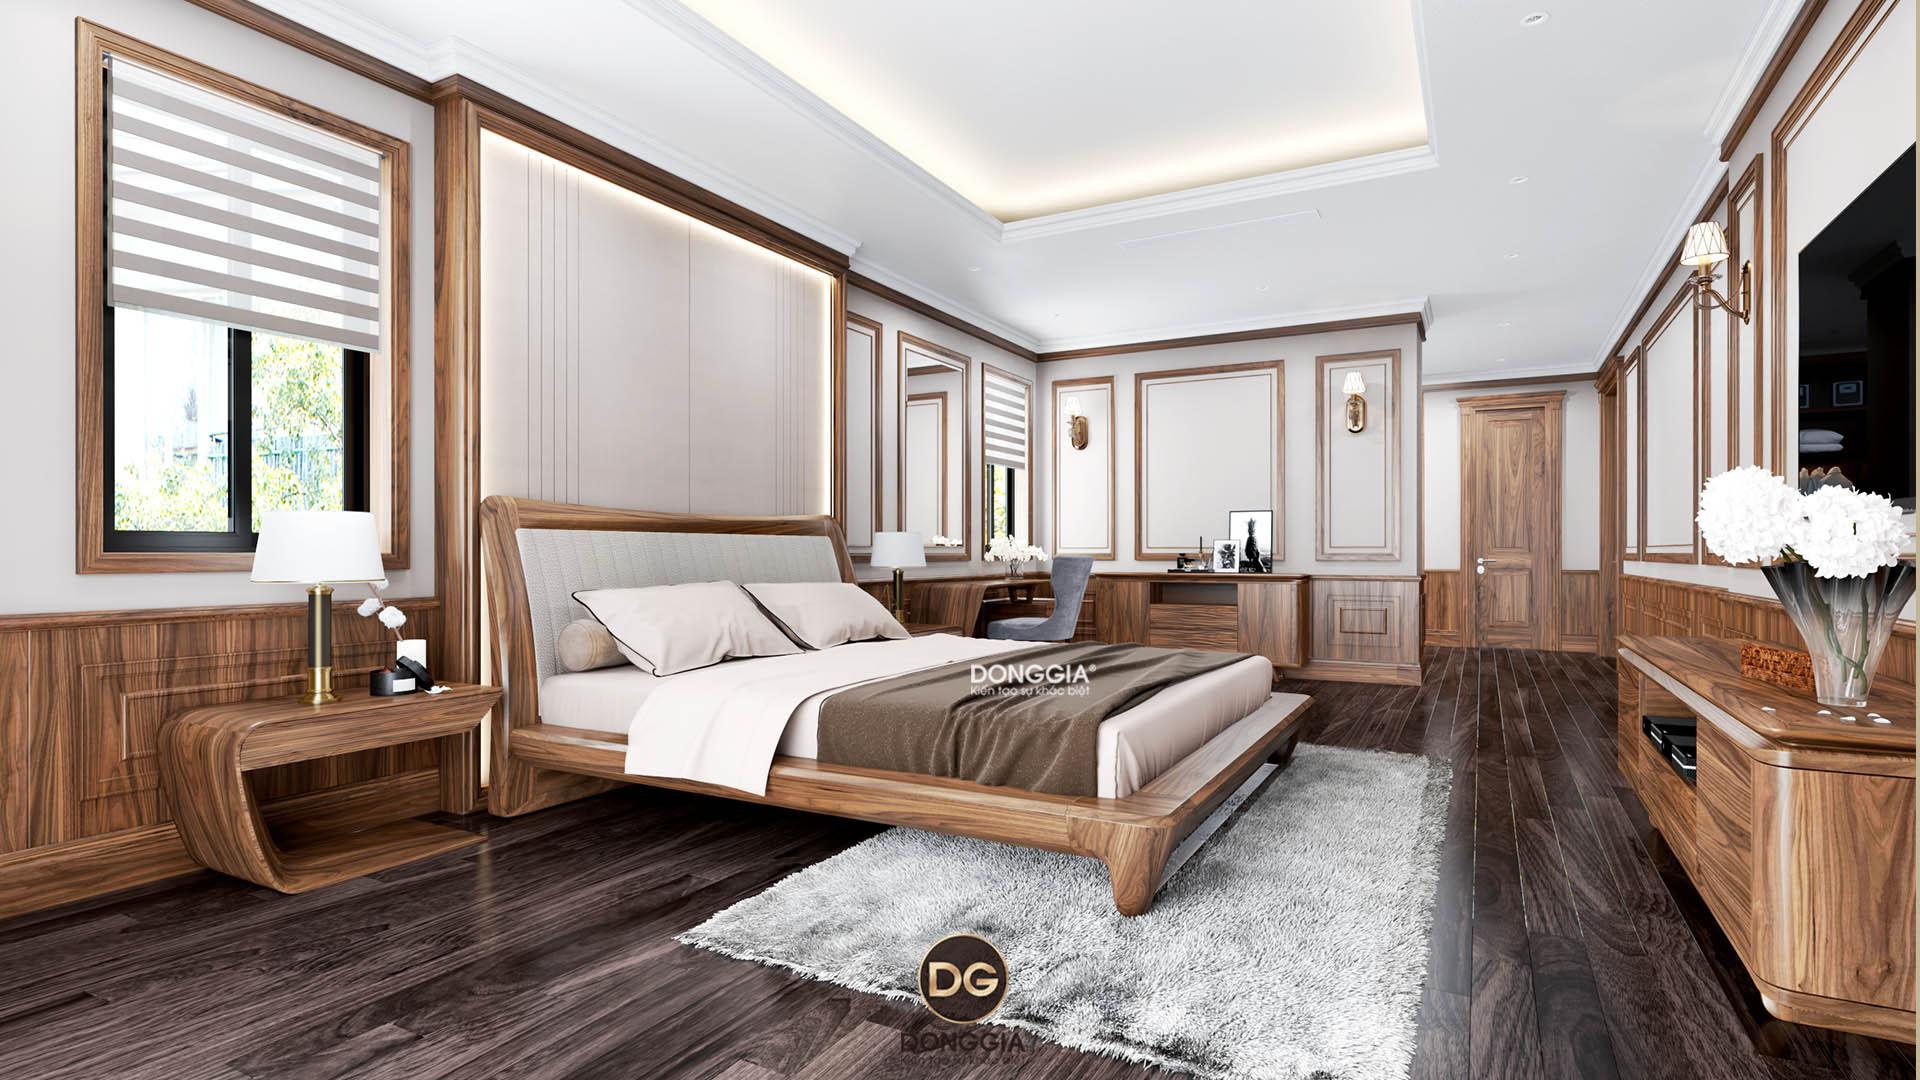 giuong-ngu-go-oc-cho-dep-nhat-2020